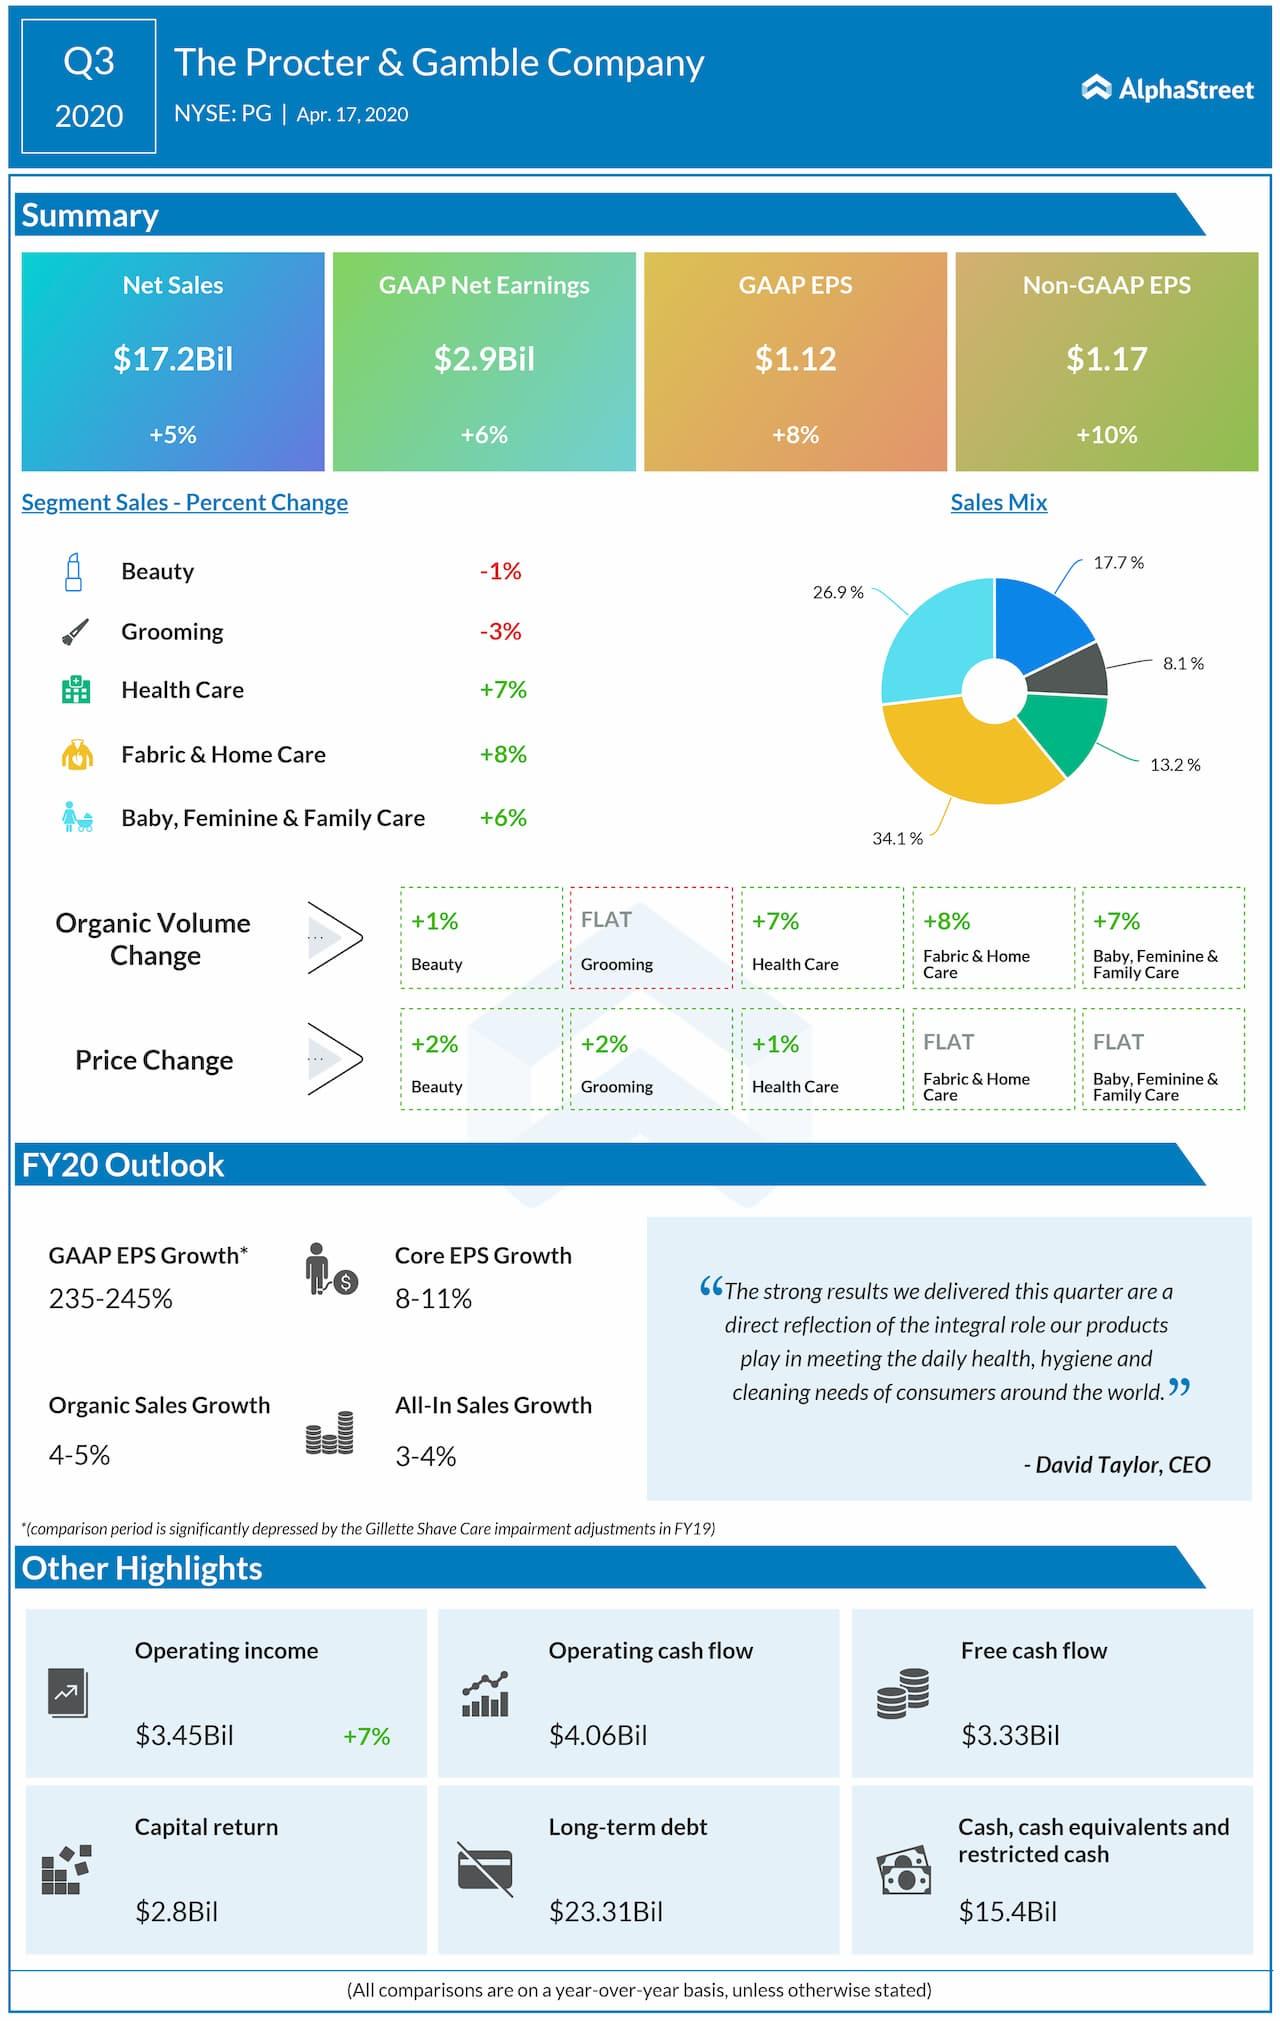 Procter & Gamble (PG) Q3 2020 earnings review